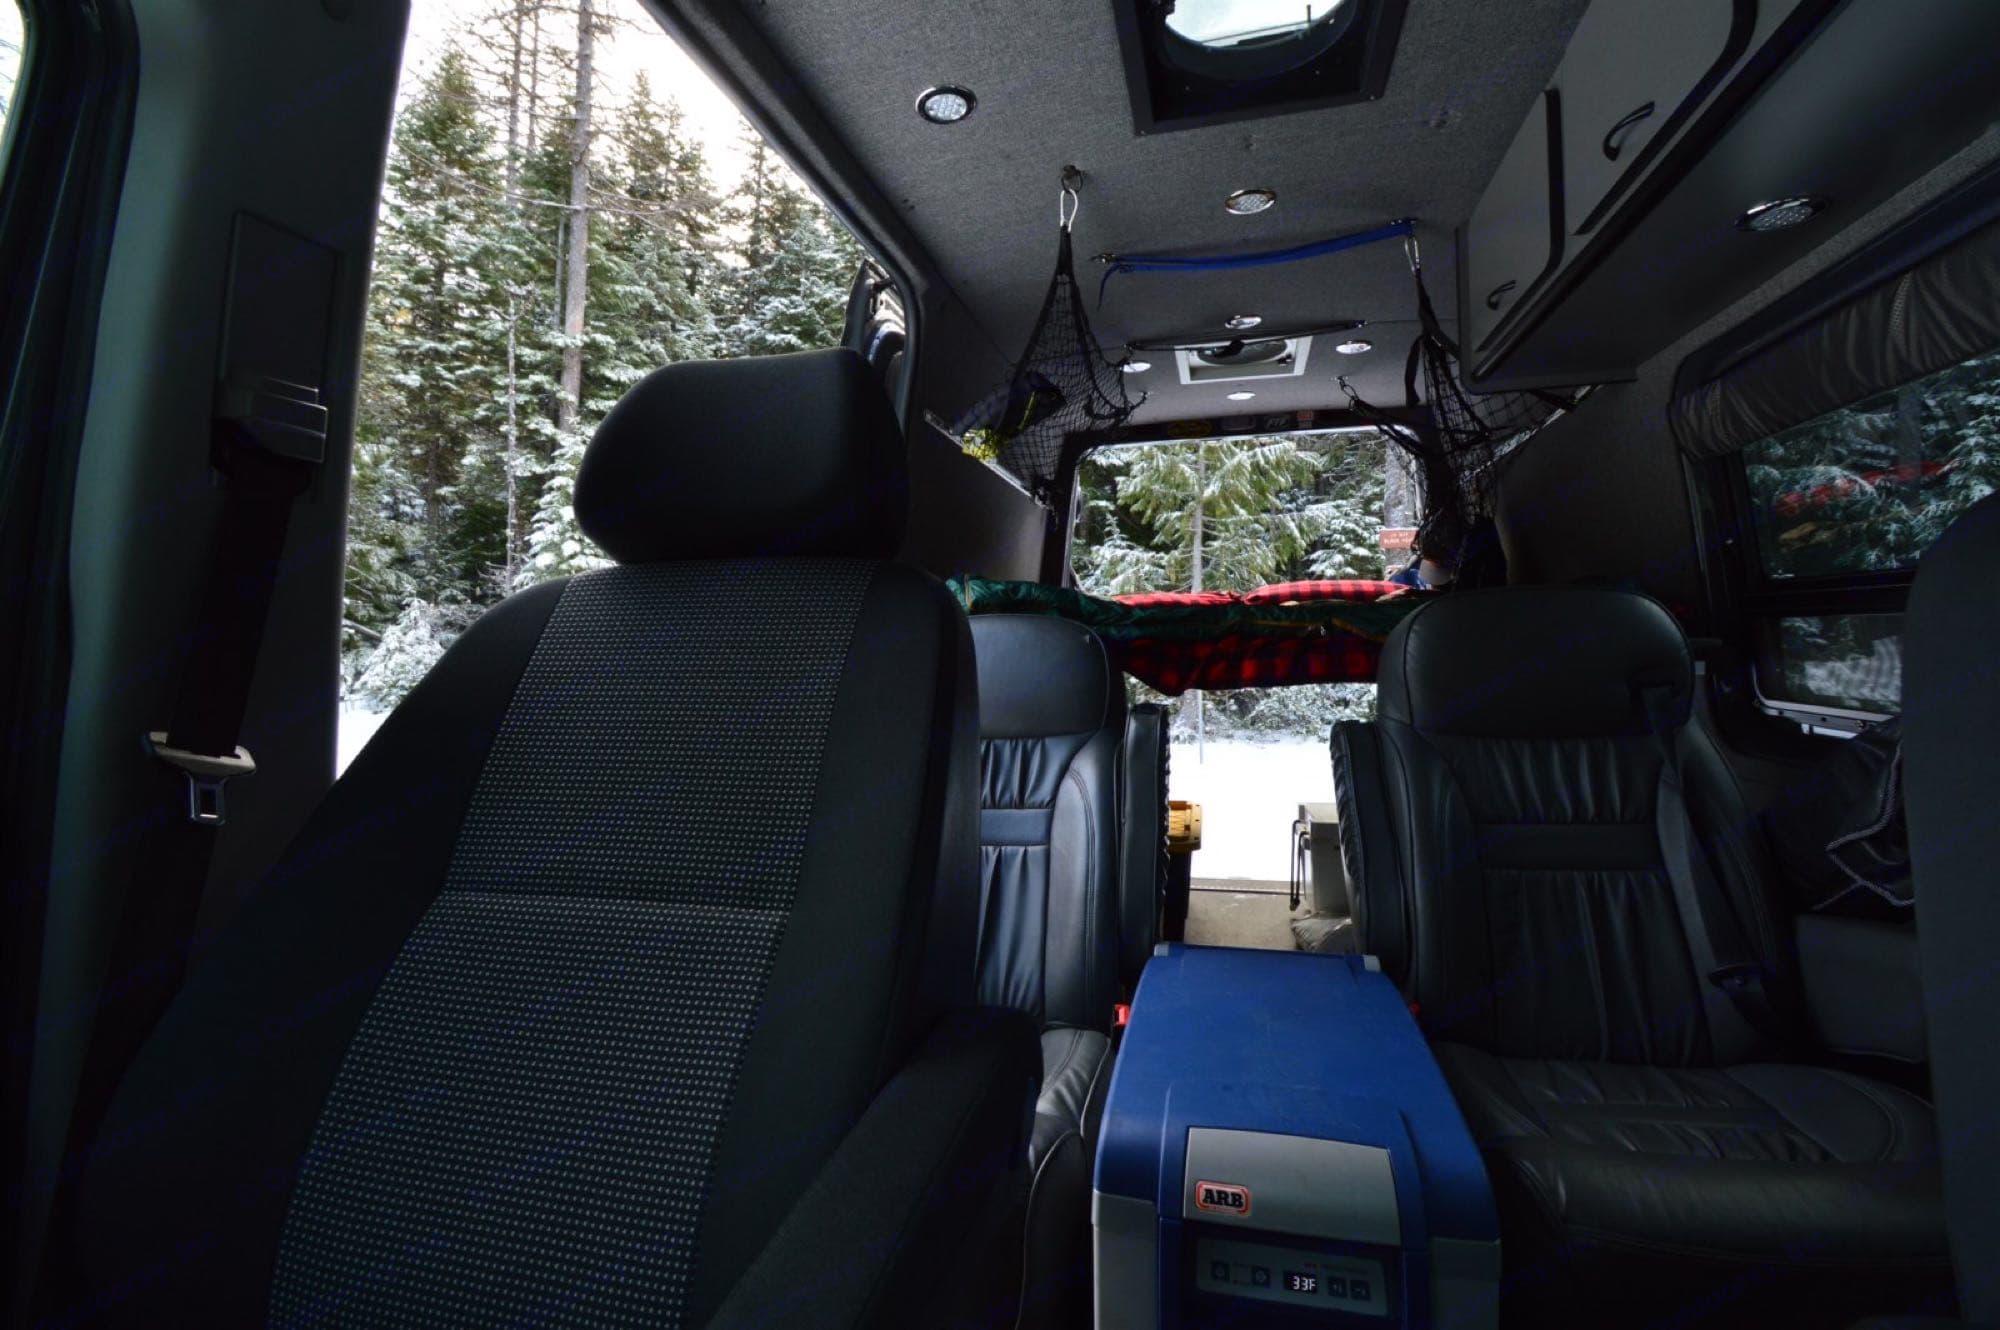 4 captains chairs! Dometic fridge! Plenty of space!. Mercedes-Benz Sprinter 2013